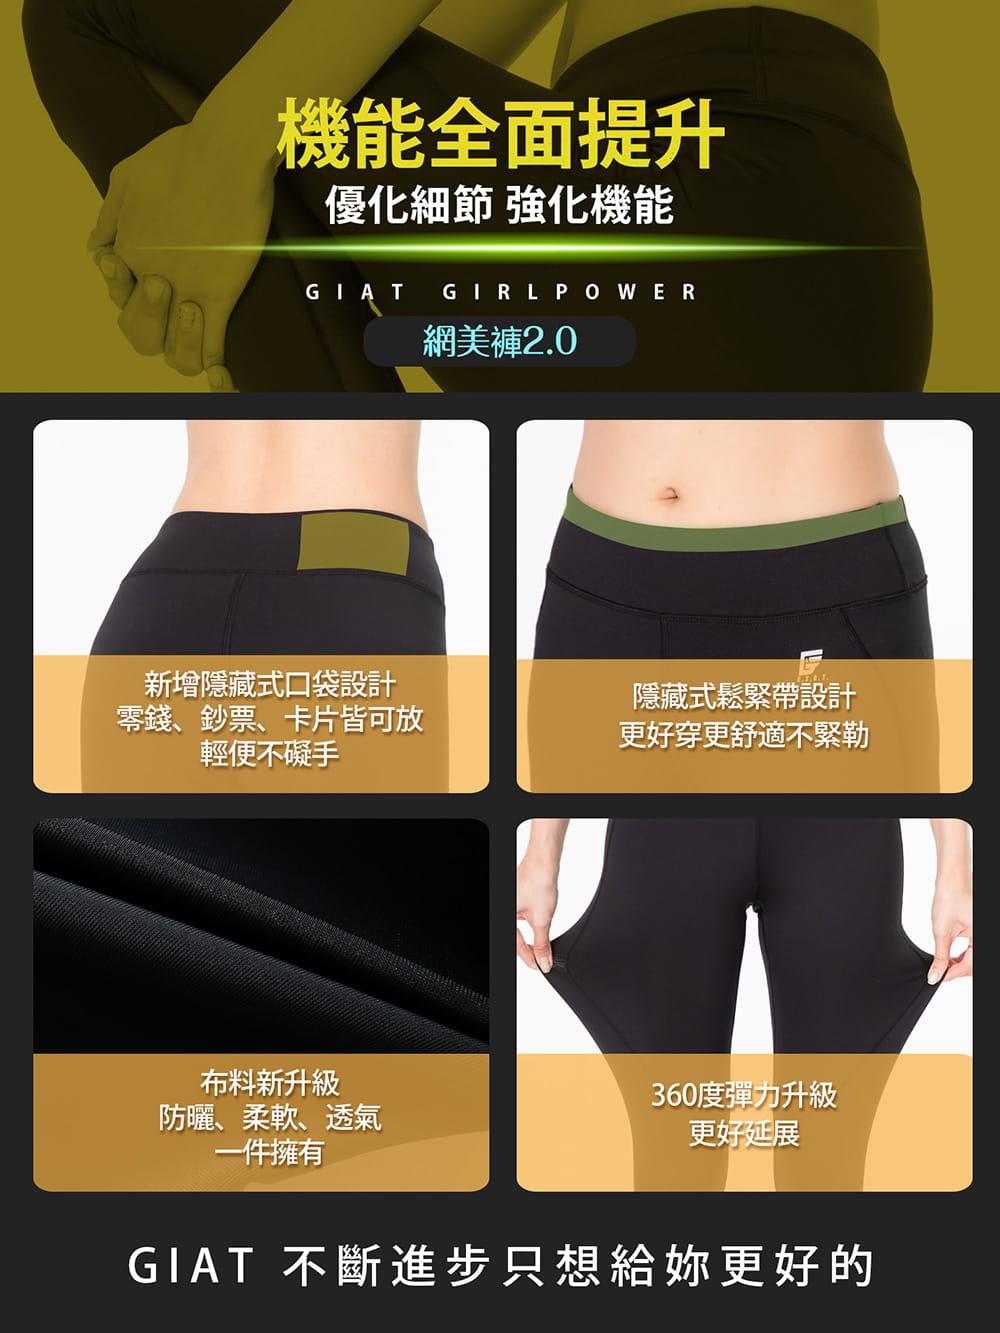 【GIAT】台灣製UV排汗機能壓力褲(網美2.0升級款) 9